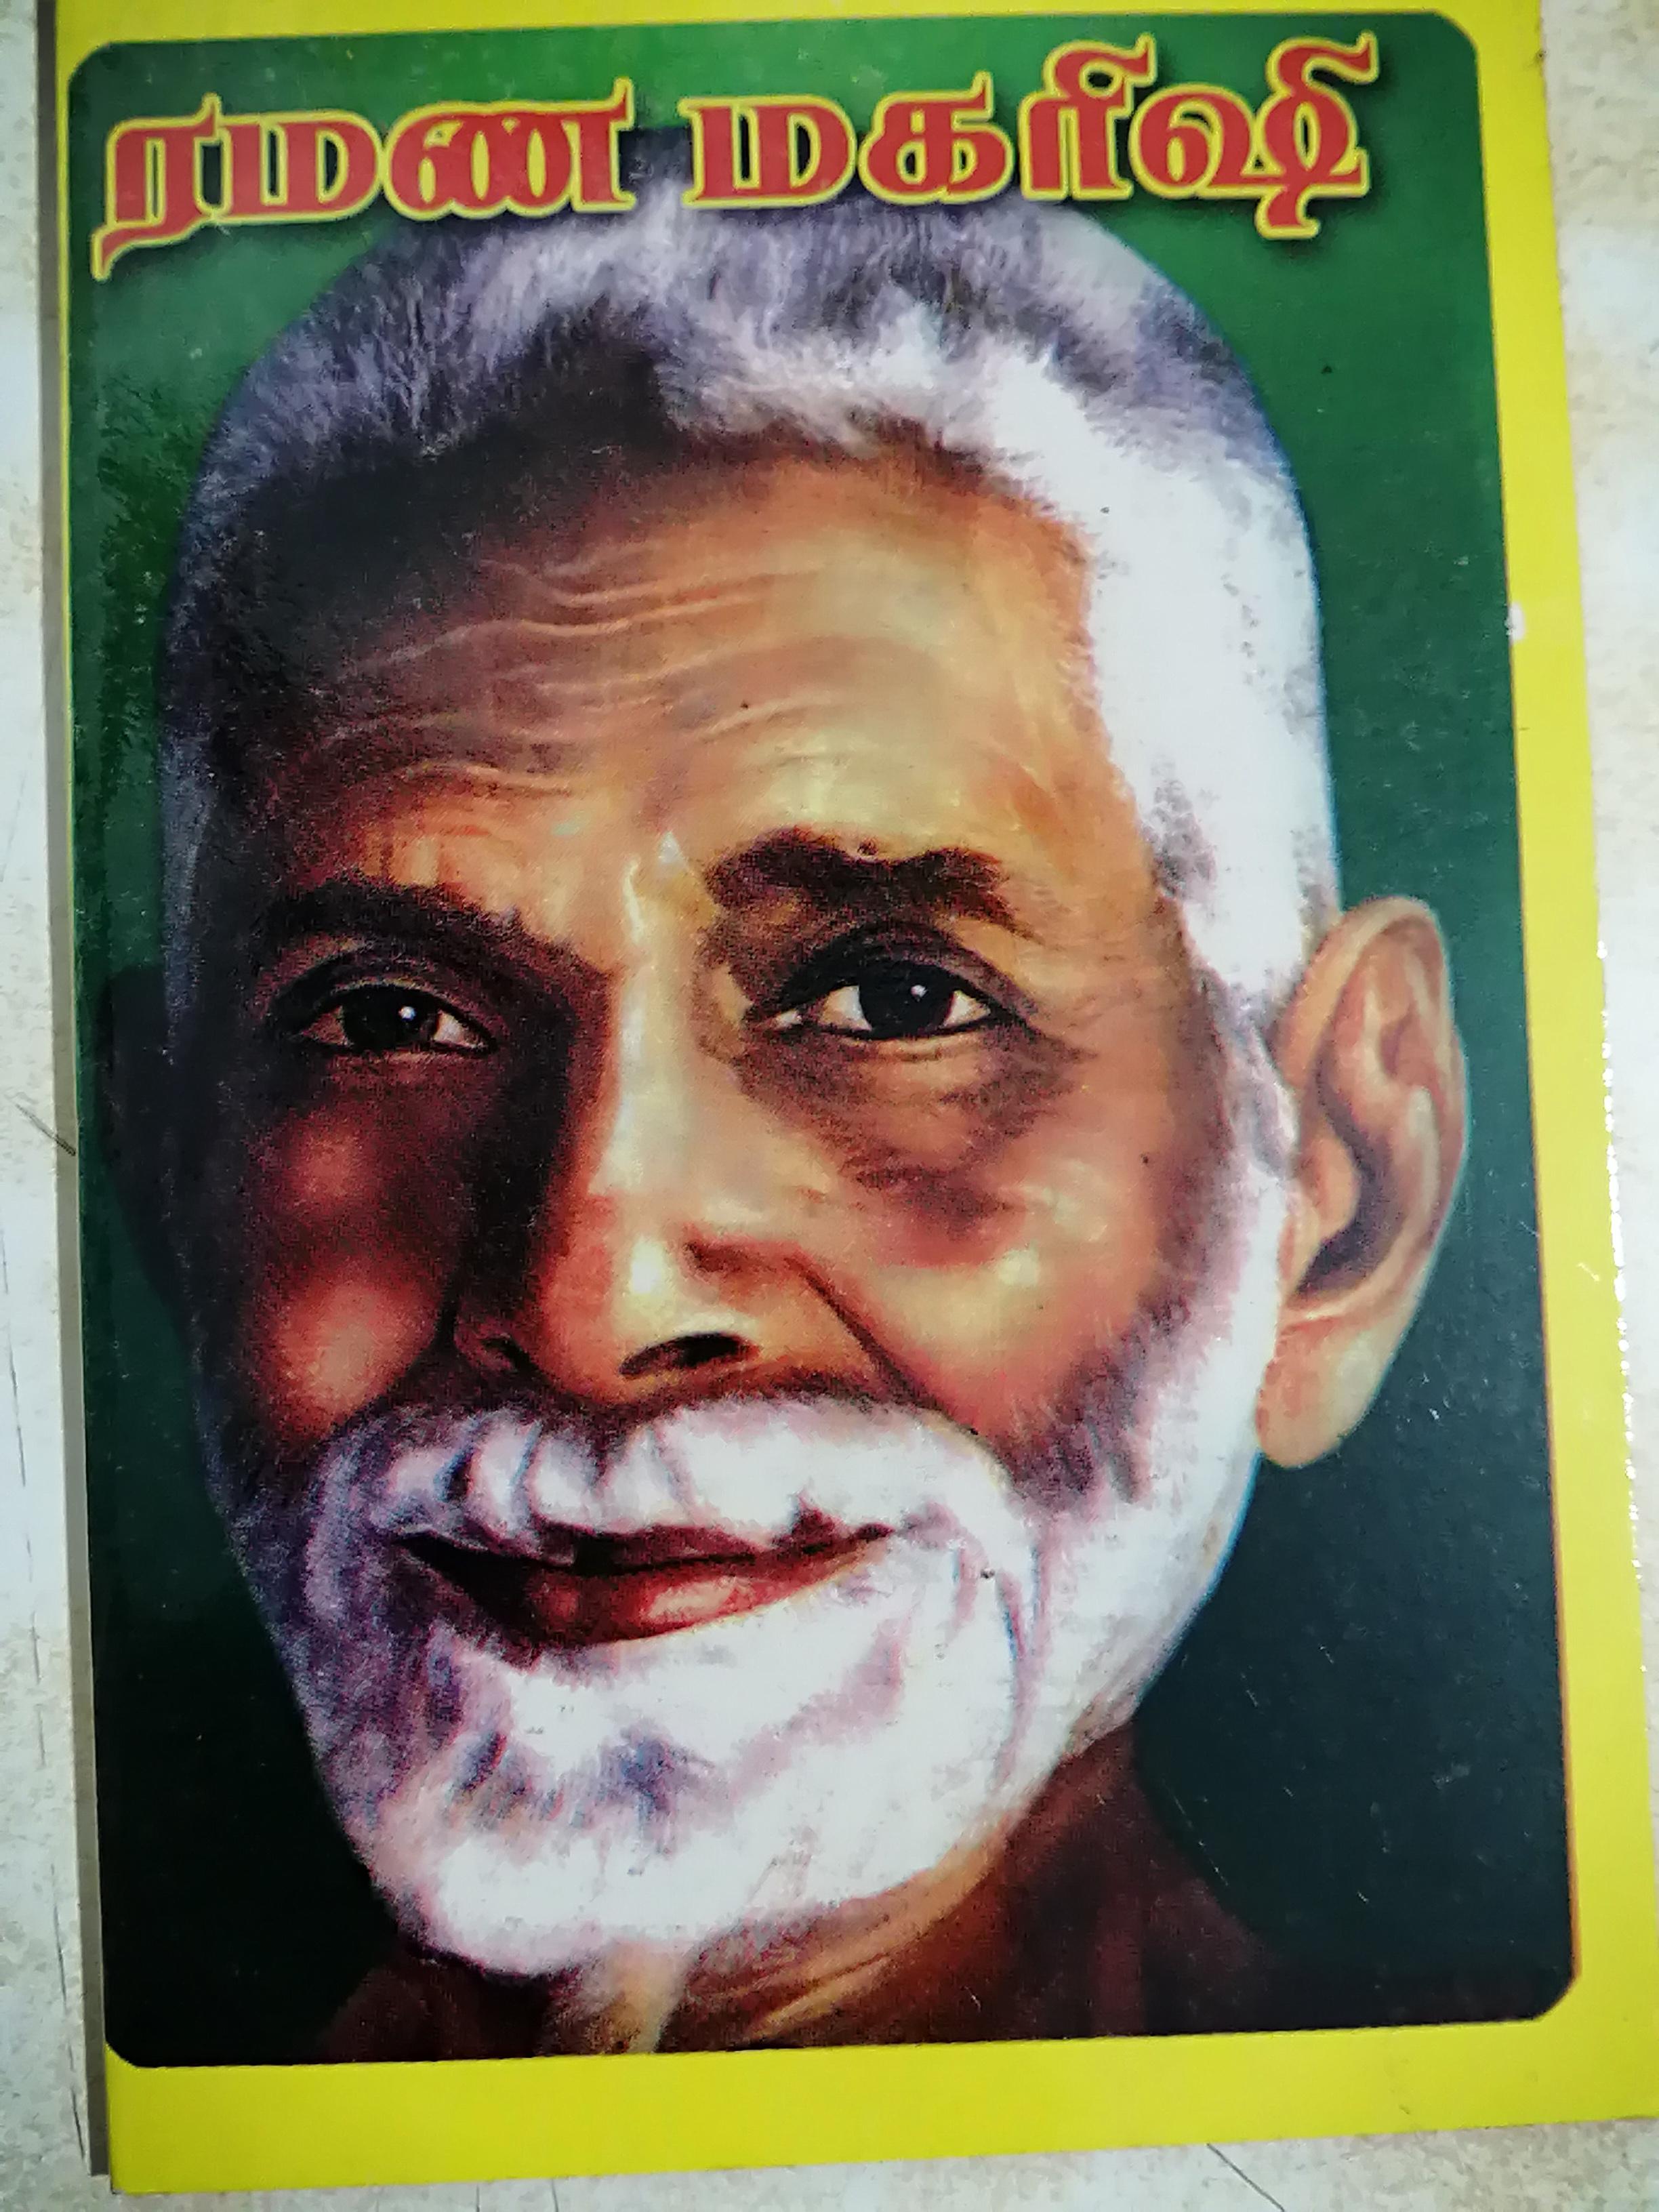 Ramana Magarishi by N V Kalaimani ரமண மகரிஷி - என். வி. கலைமணி